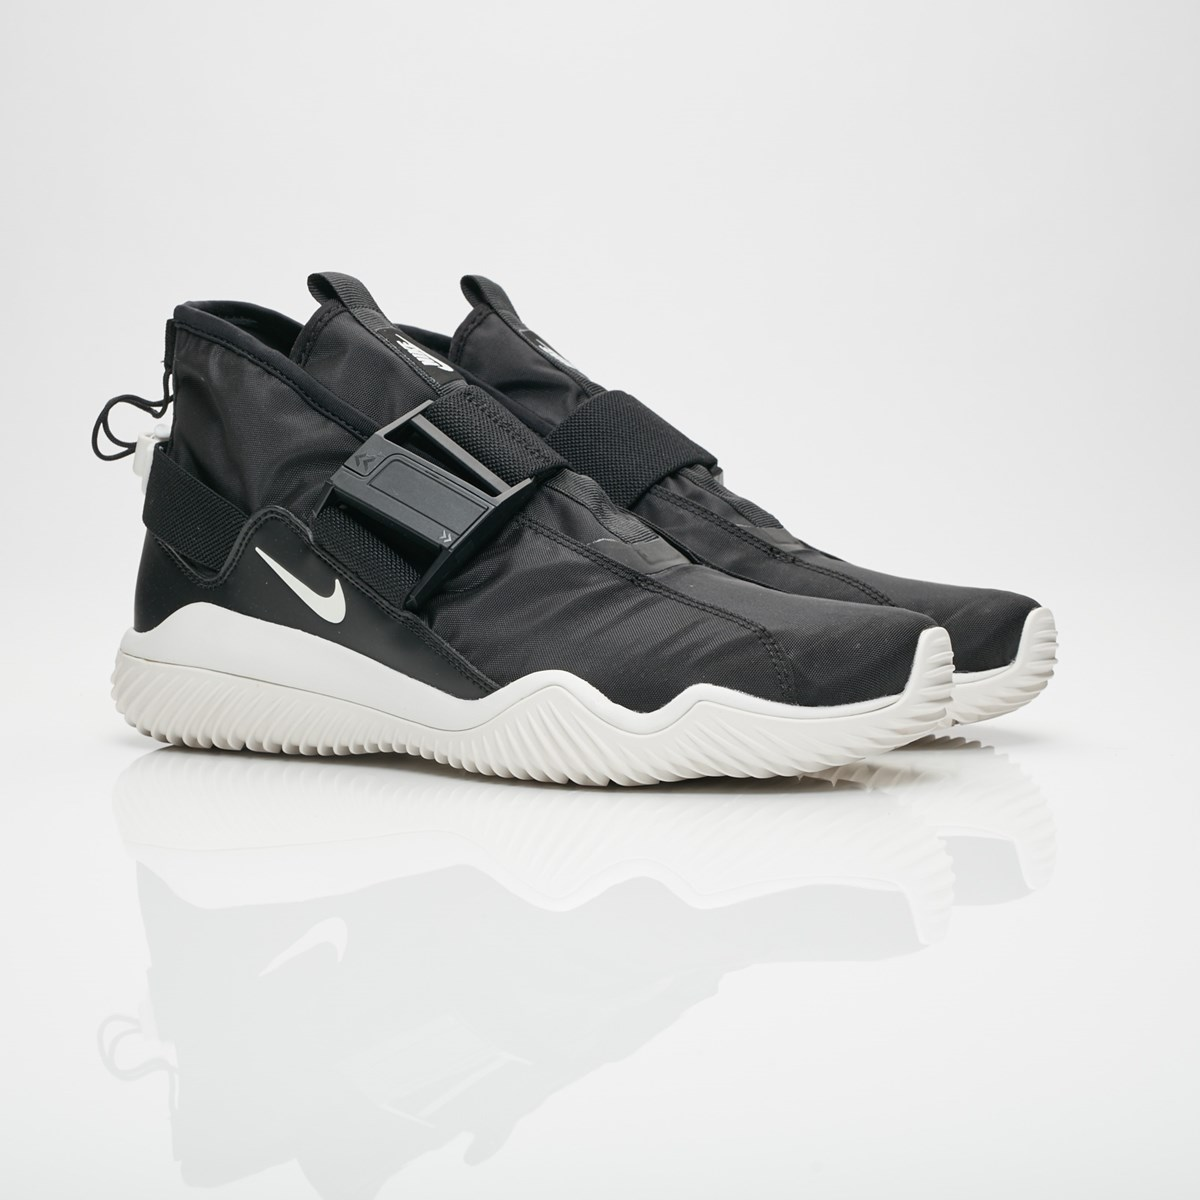 the best attitude 67596 c25f9 nike komyuter aa2211 001 sneakers   streetwear på nätet sen 1999